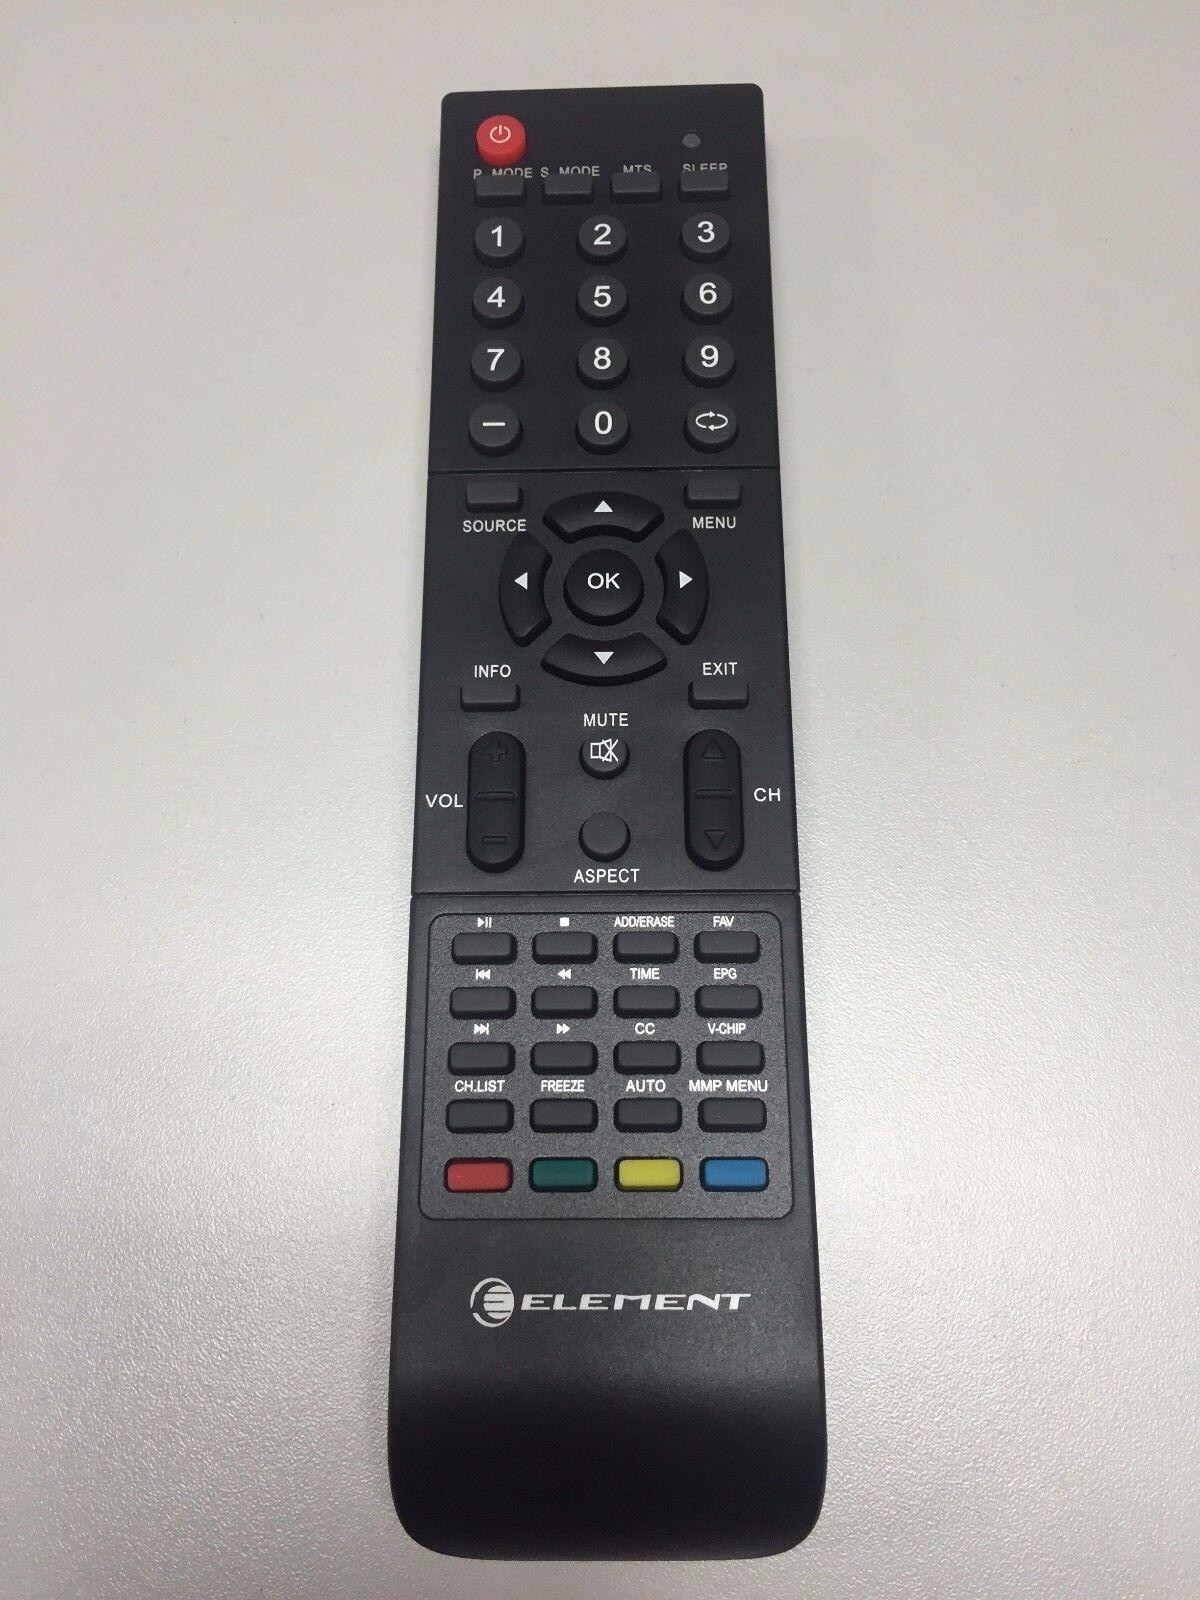 ELEMENT LED TV REMOTE CONTROL I14000000632 for ELDFT551 ELDFW462